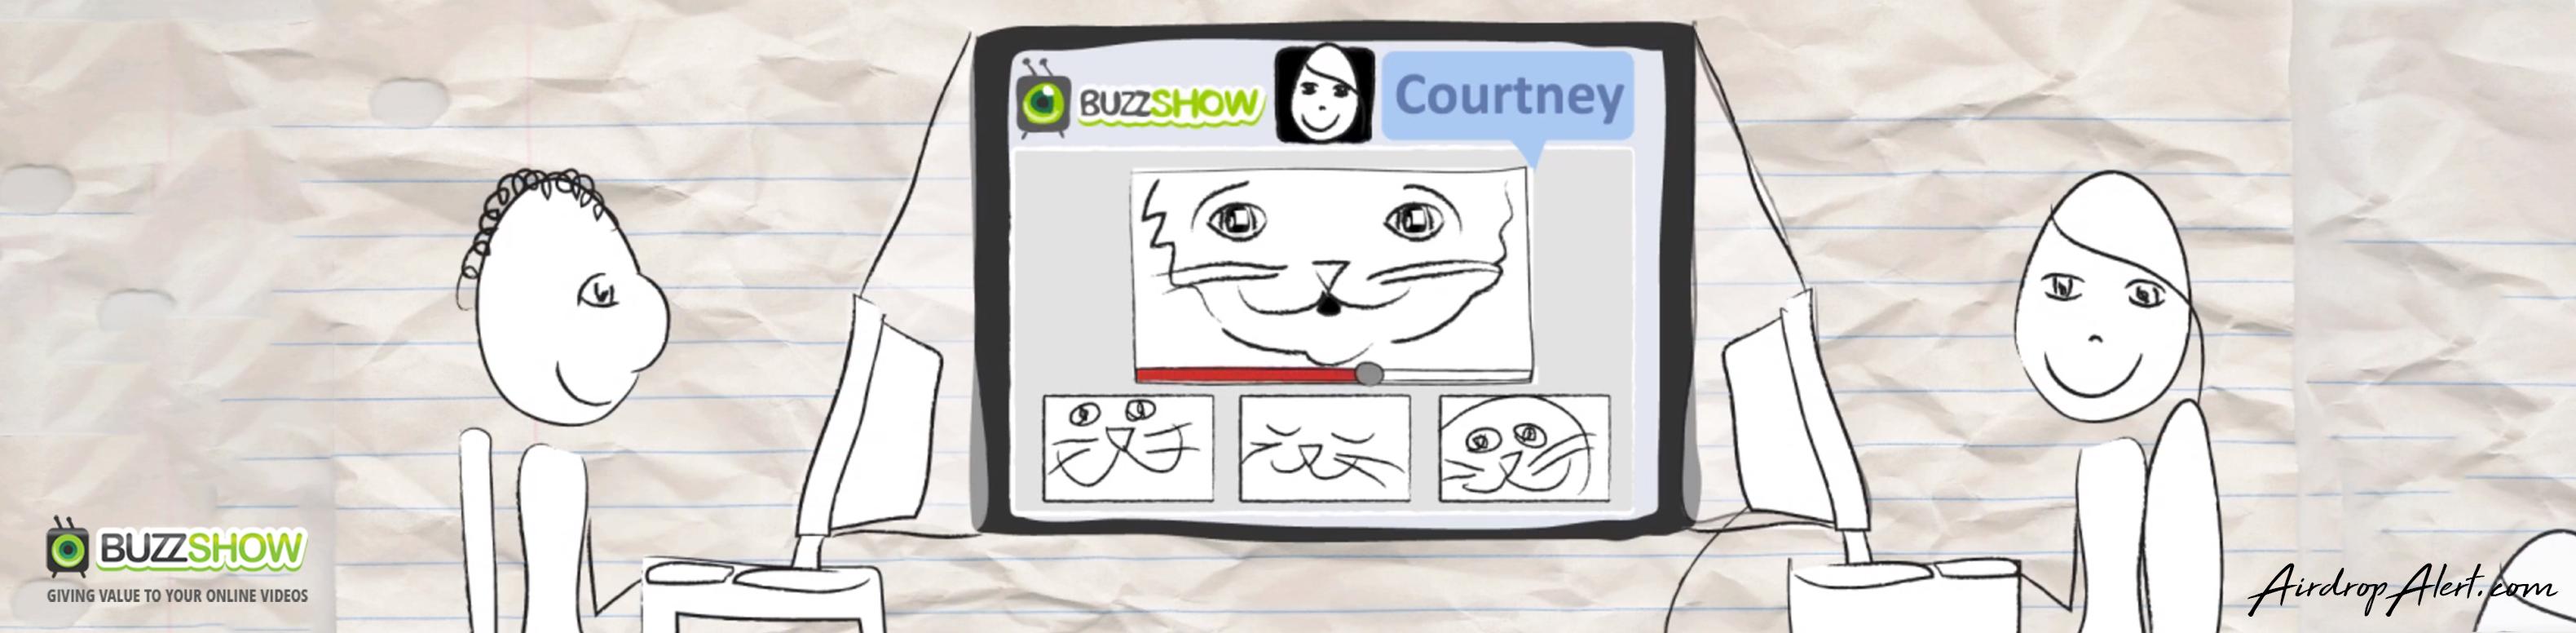 BuzzShow Exclusive